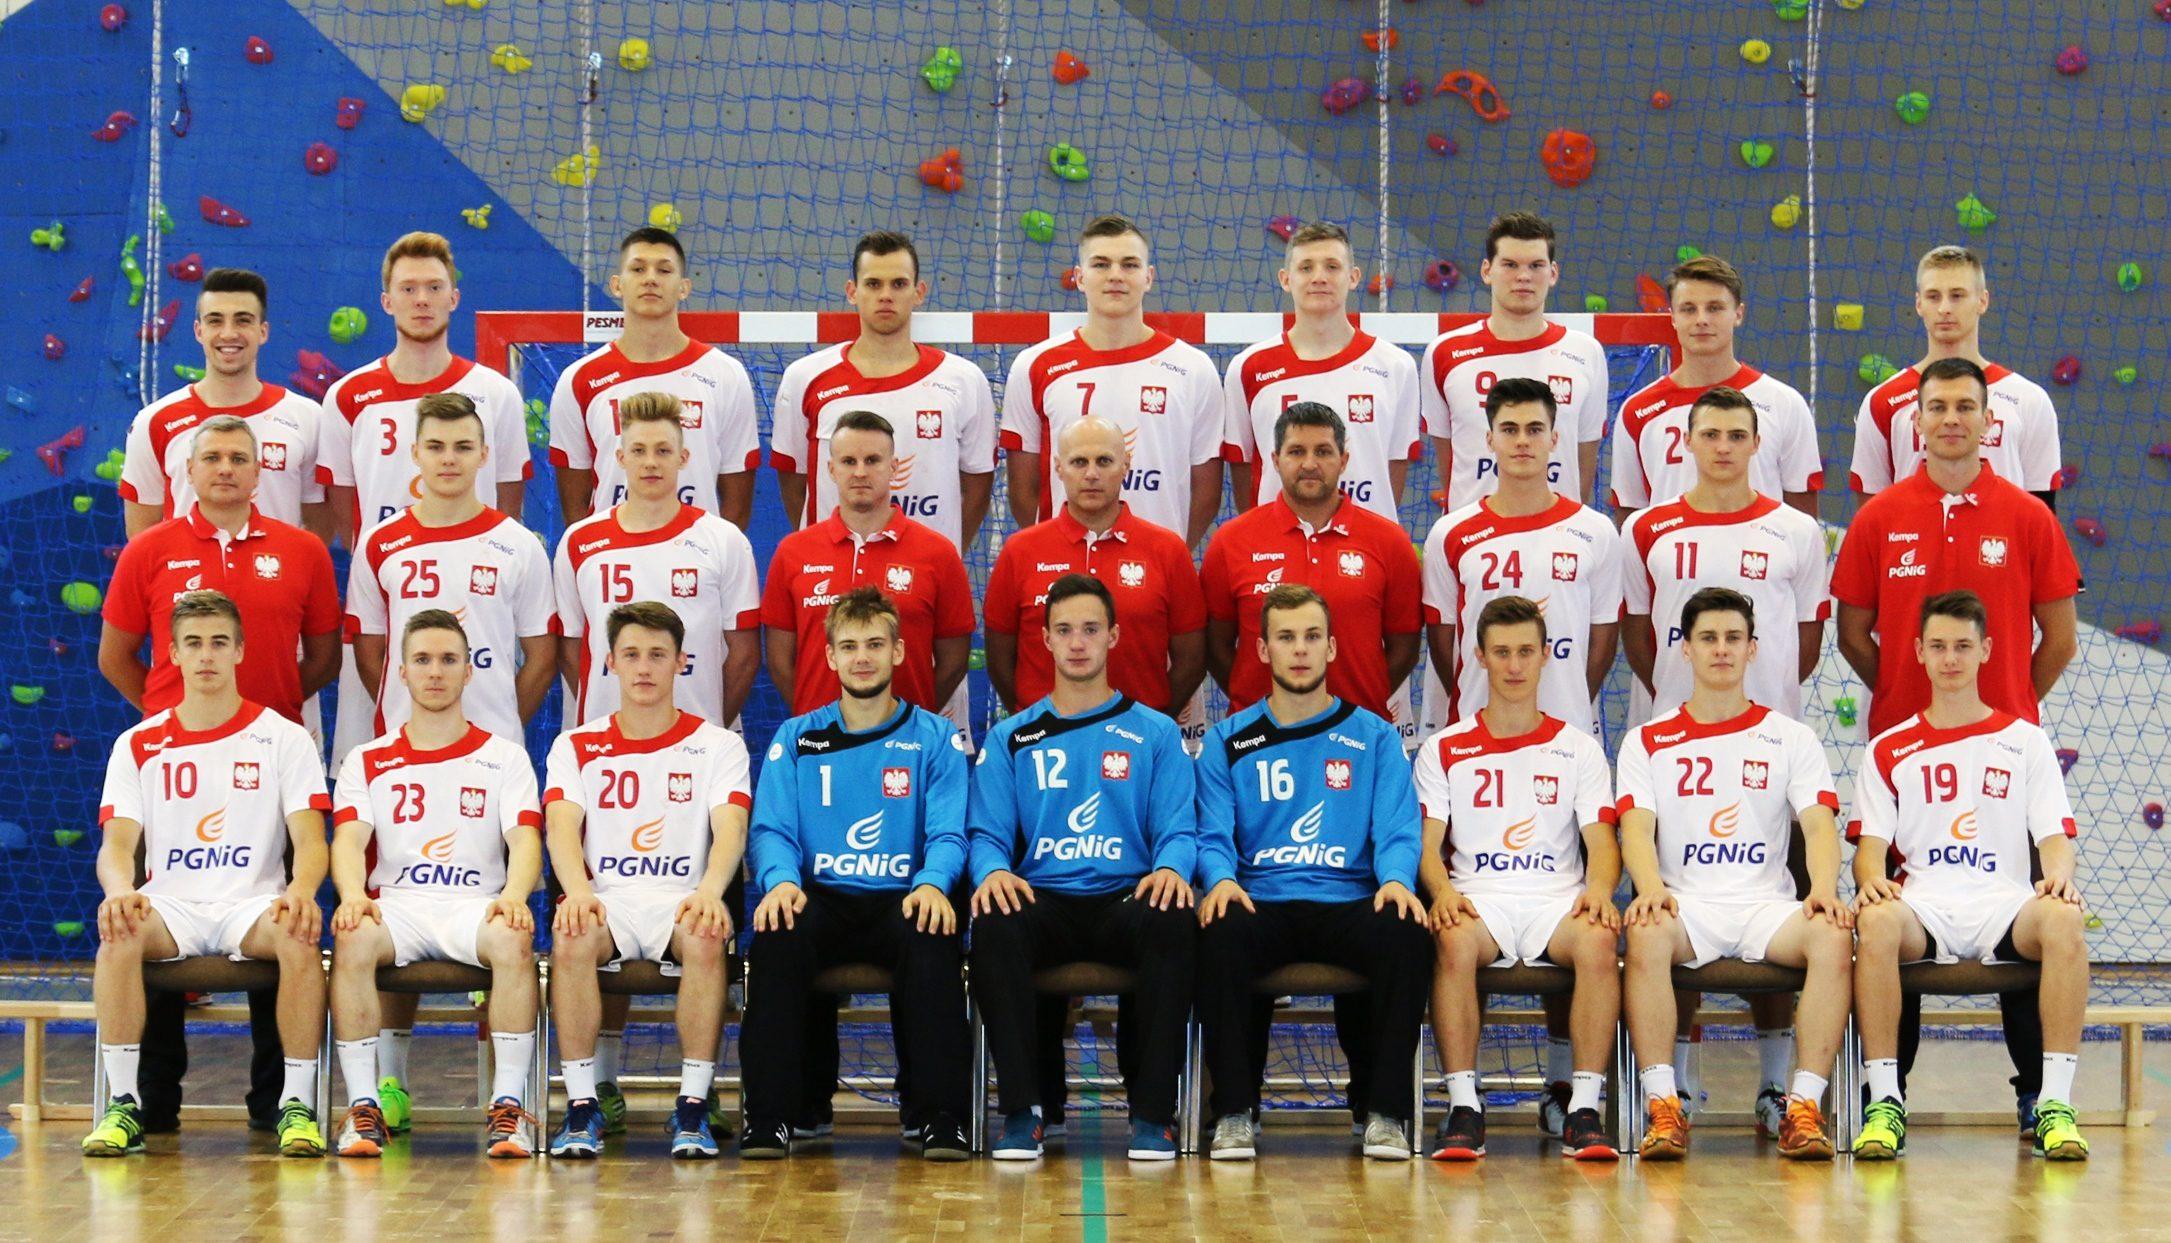 Polish M18 national team photo 2 - EC in Croatia 10-22.08.16